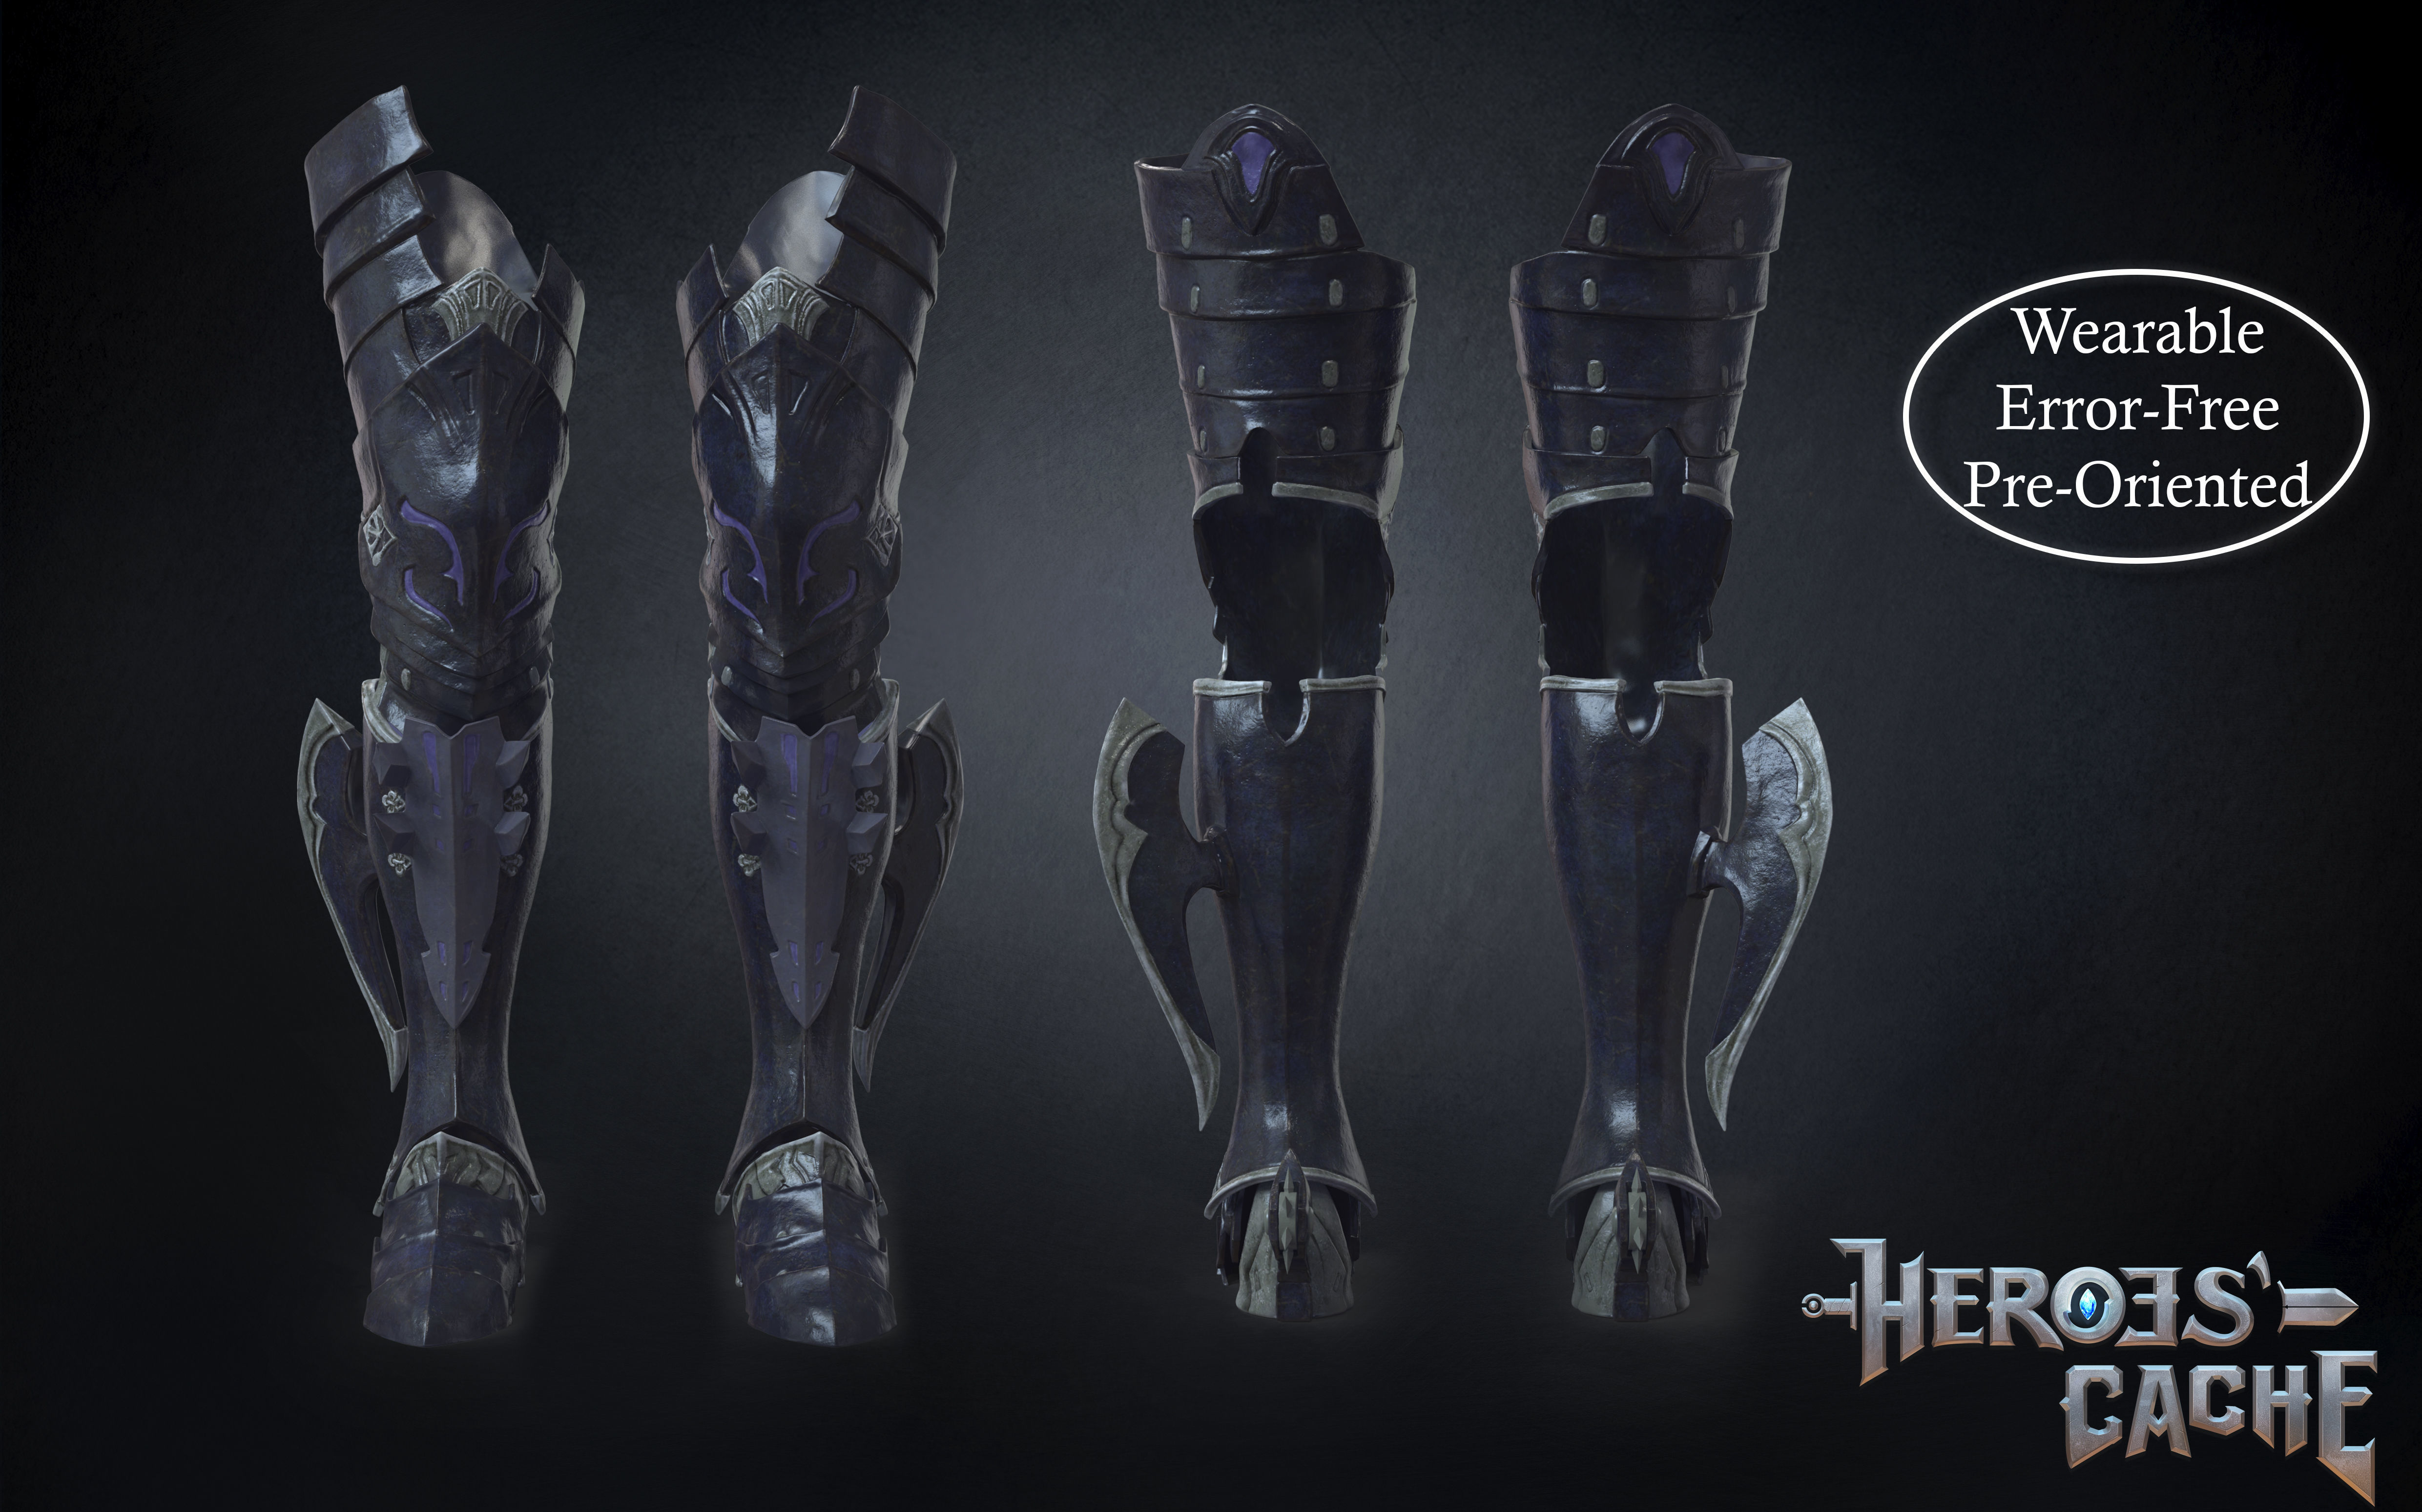 Final Fantasy XIV - Drachen Armor - Legs